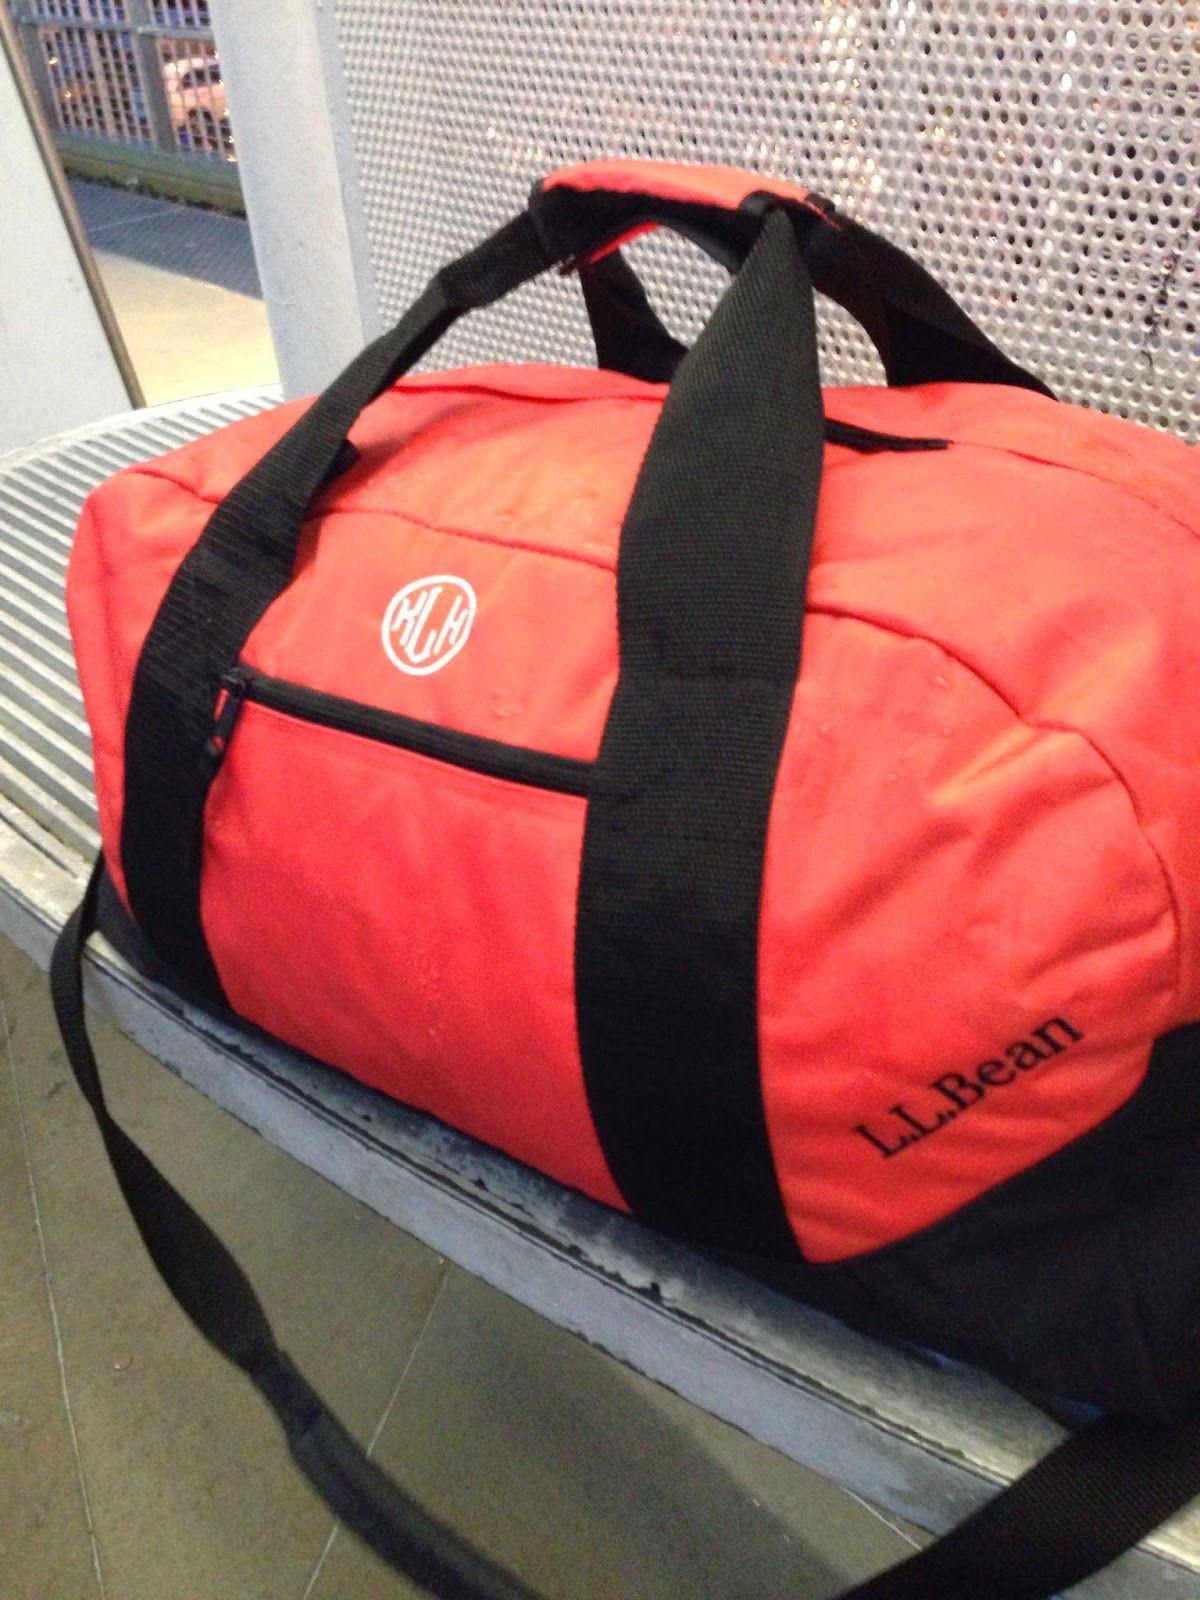 High Peaks Hiker - Kilimanjaro training blog  Gear Review - L.L. Bean  Duffel Bag 24045a194d